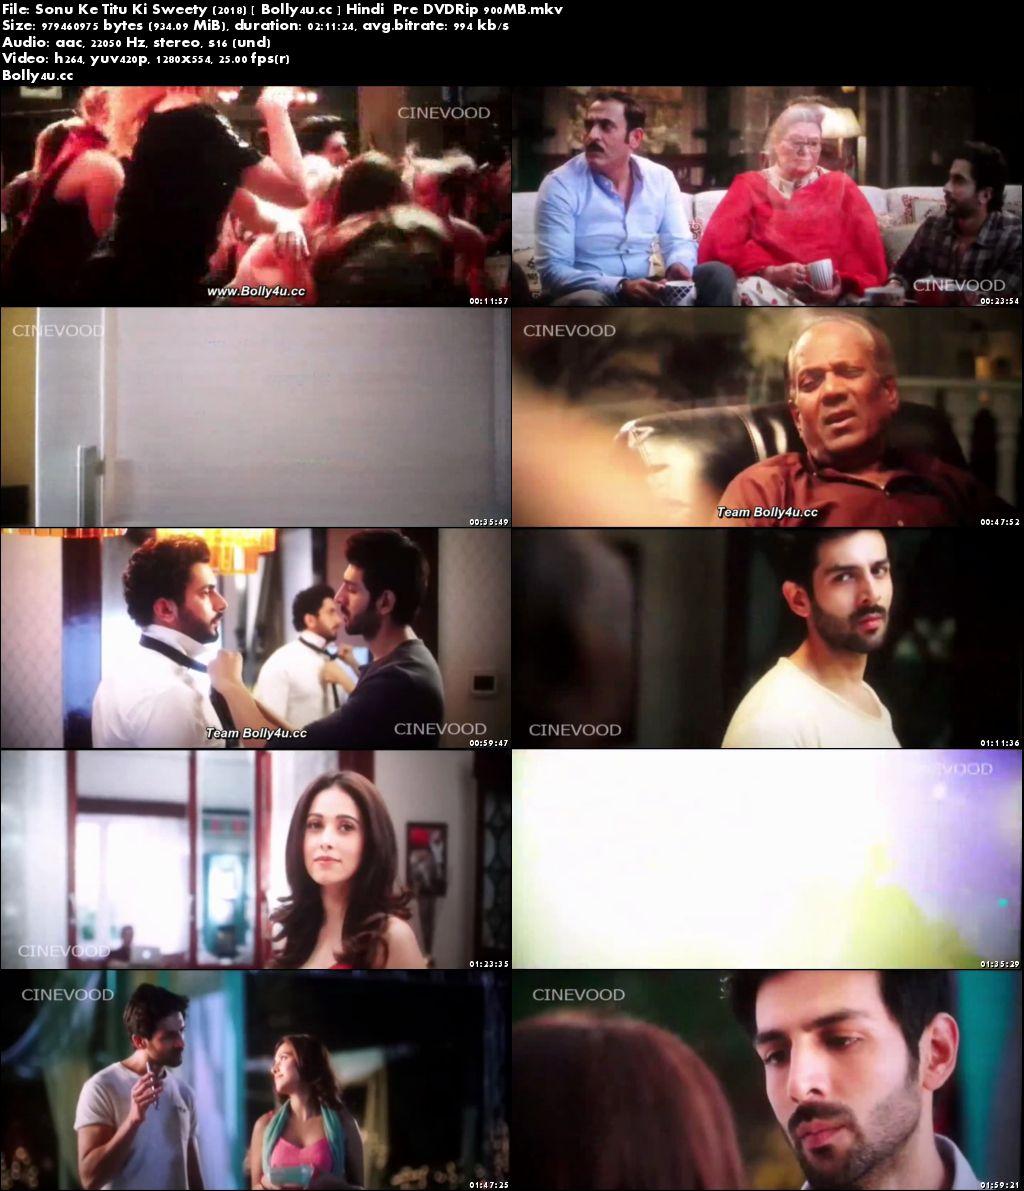 Sonu Ke Titu Ki Sweety 2018 Pre DVDRip Full Hindi Movie Download x264